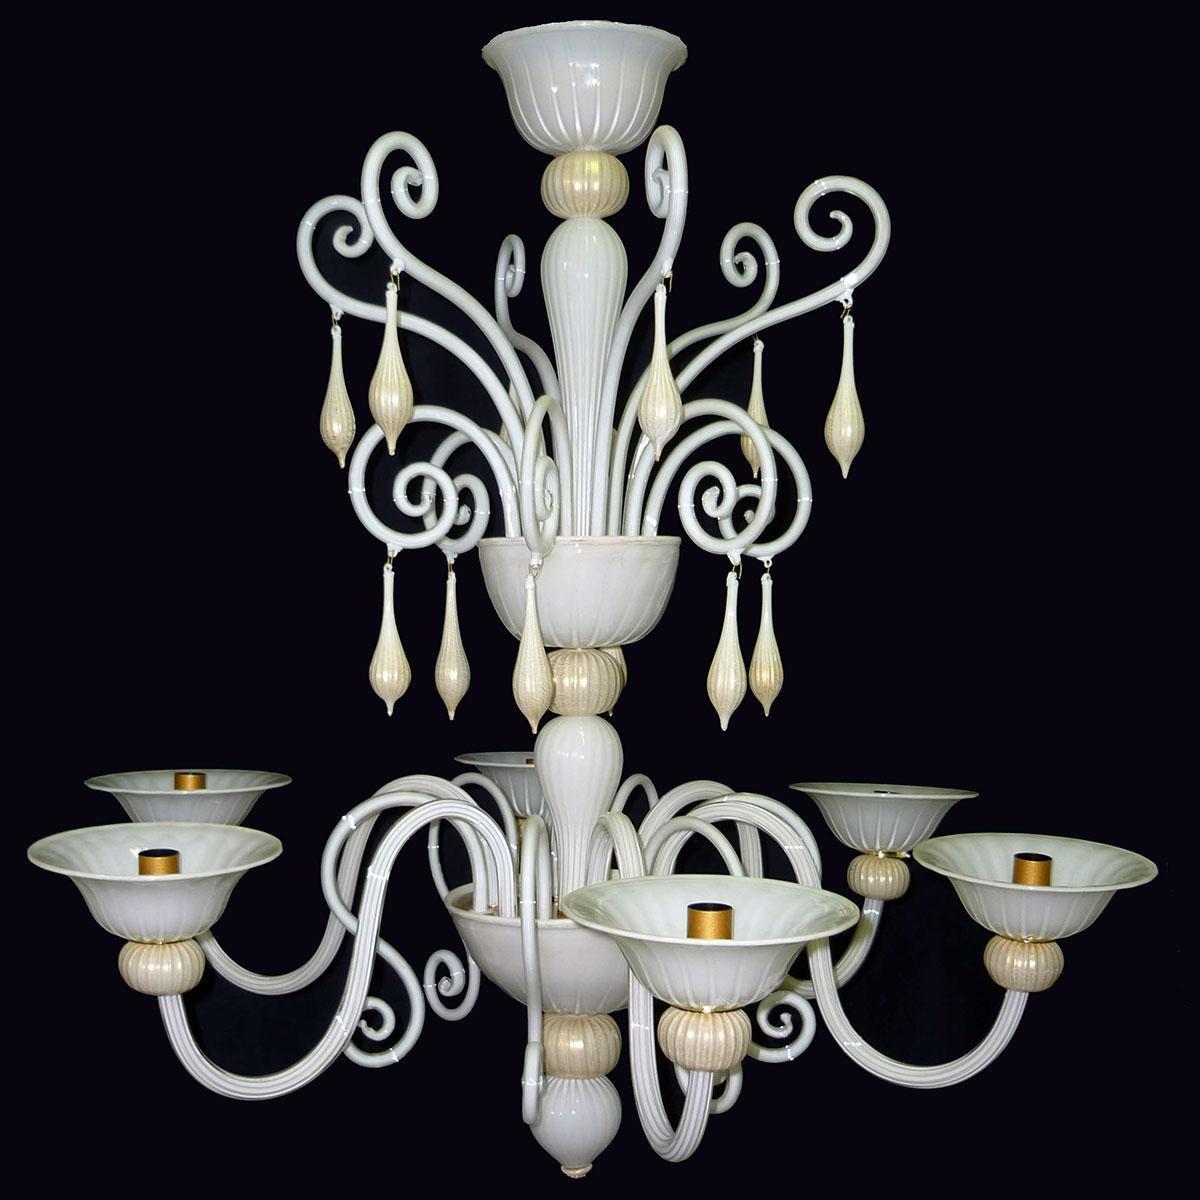 """Riccio Bianco"" lustre en cristal de Murano - 6 lumières"